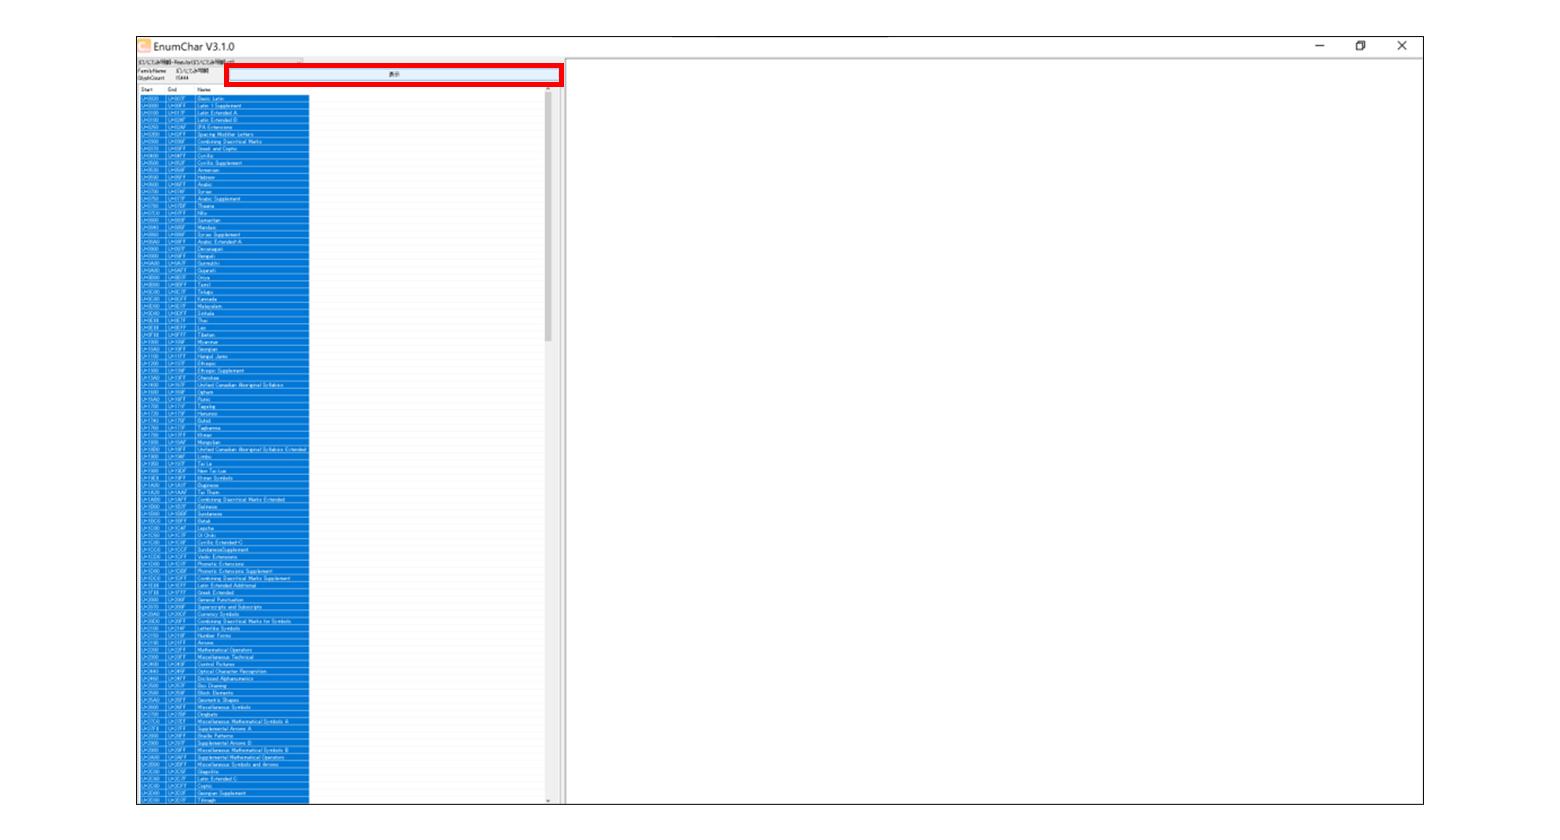 EnumCharの画面